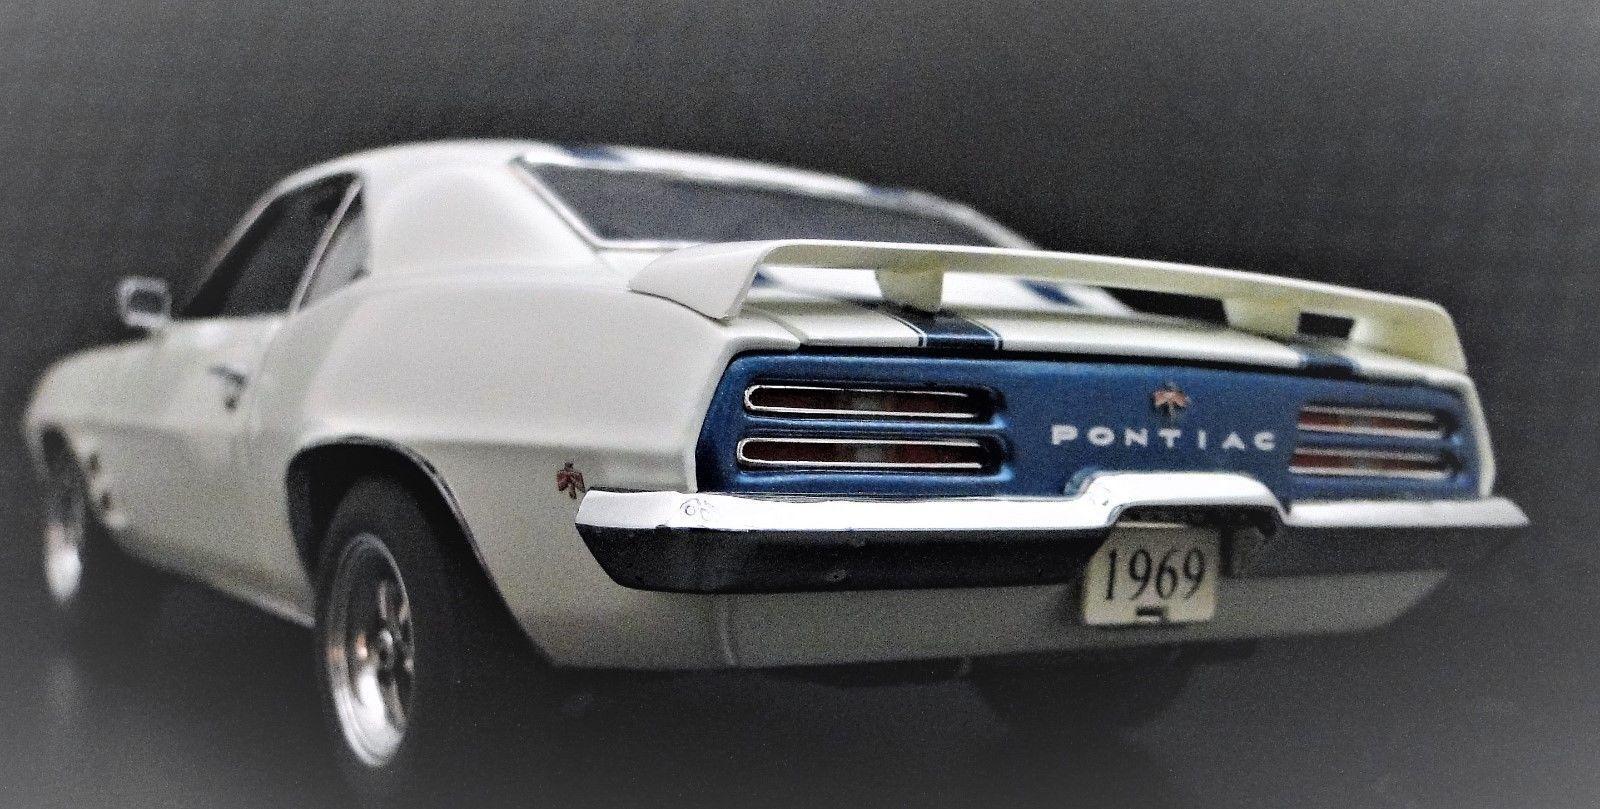 Pontiac Trans Am 1969 Firebird 1 SPORT RACE CAR 12 Vintage 24 Metal 18 Racer 43